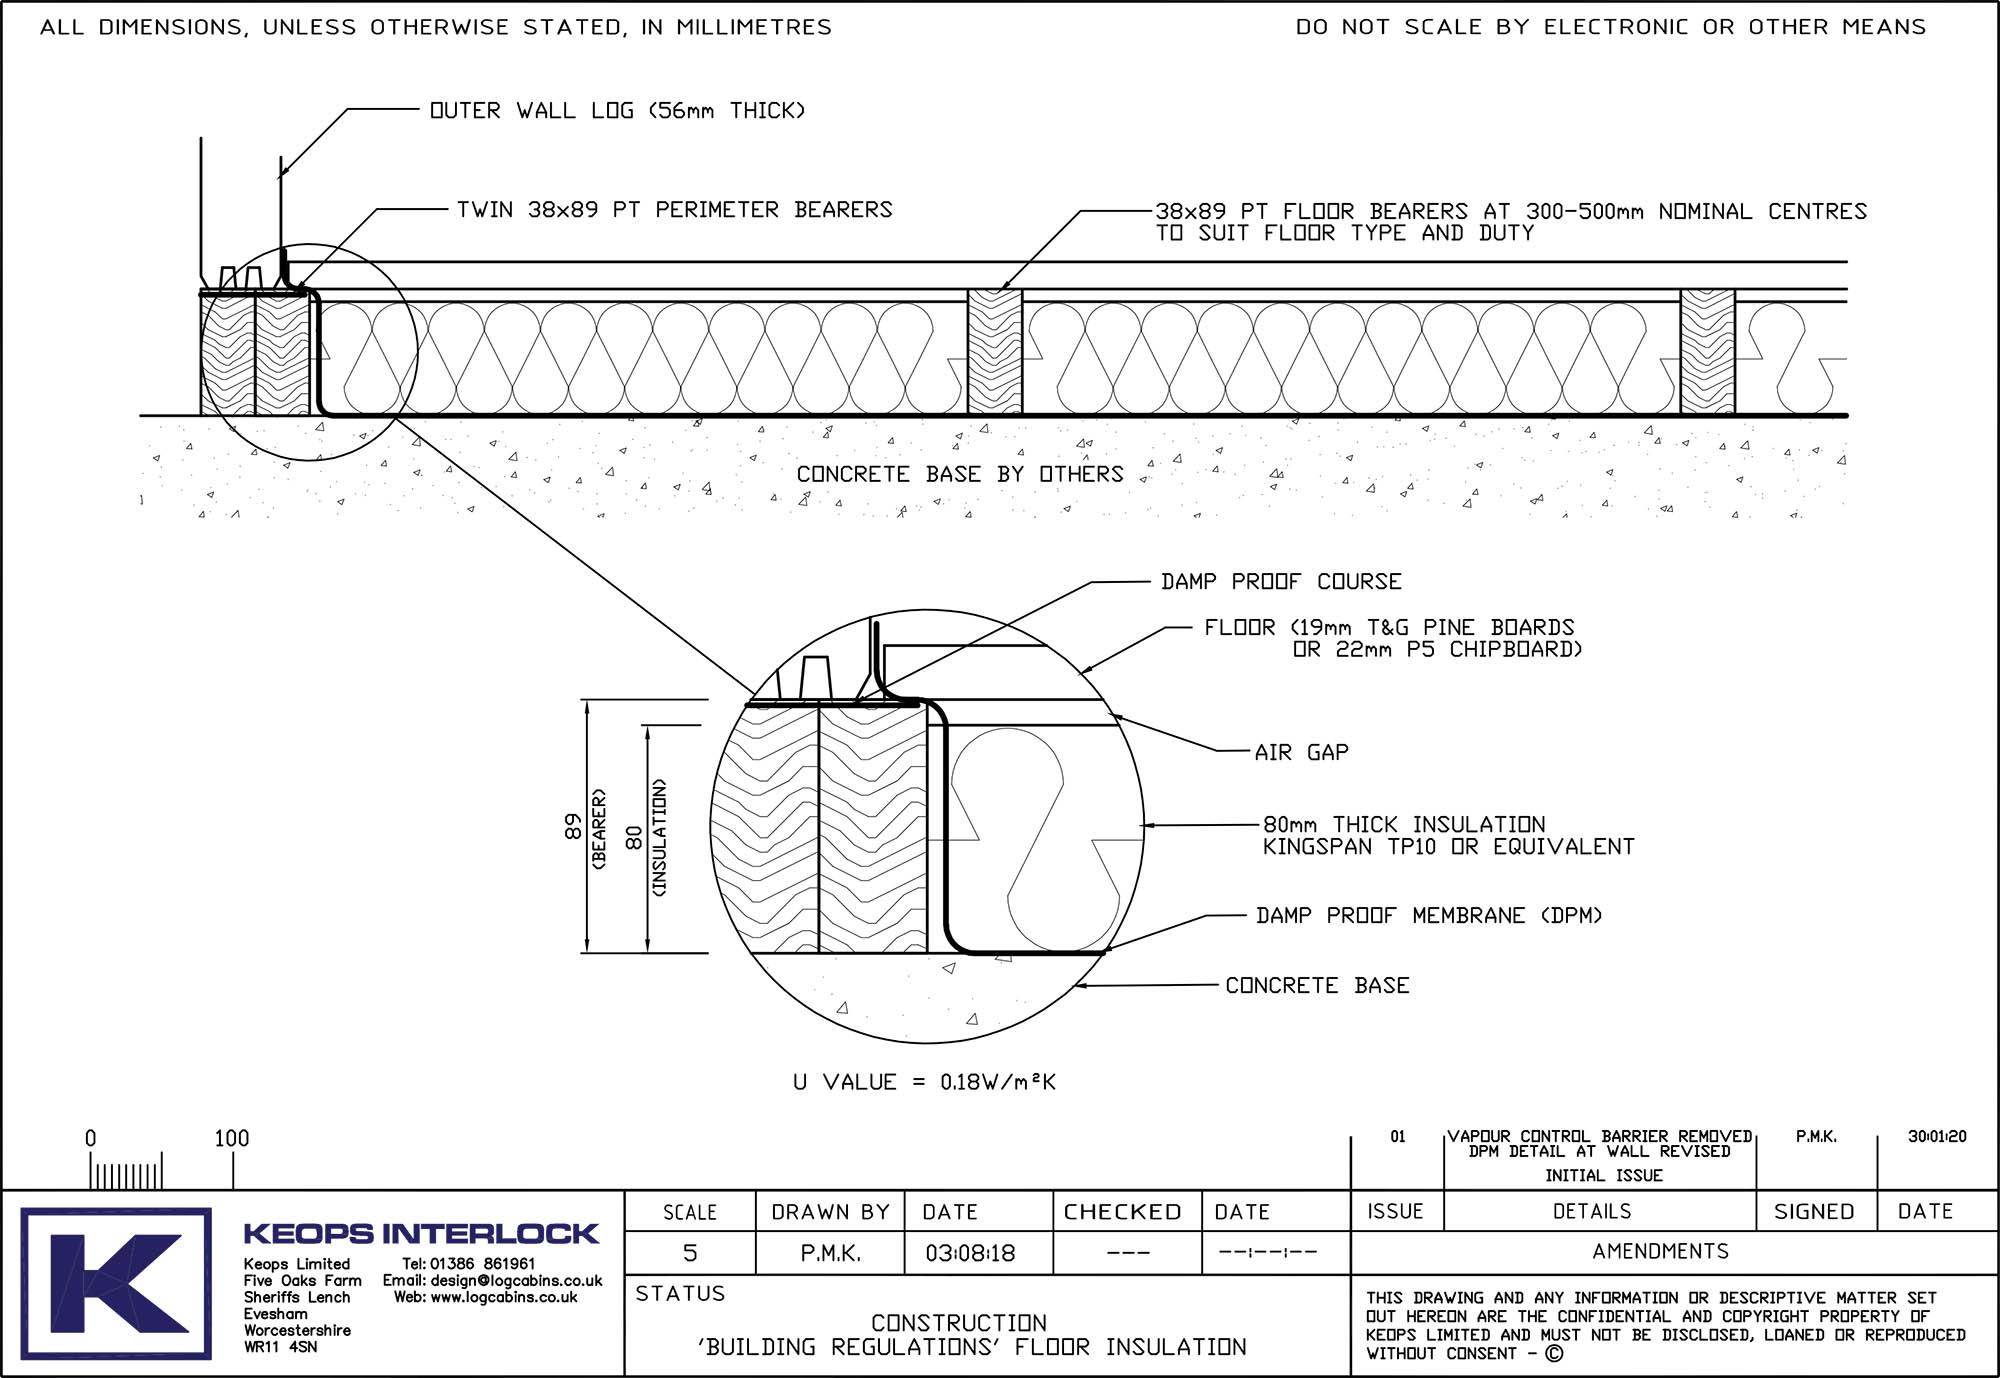 Keops Interlock Building Regulations floor insulation for log cabins